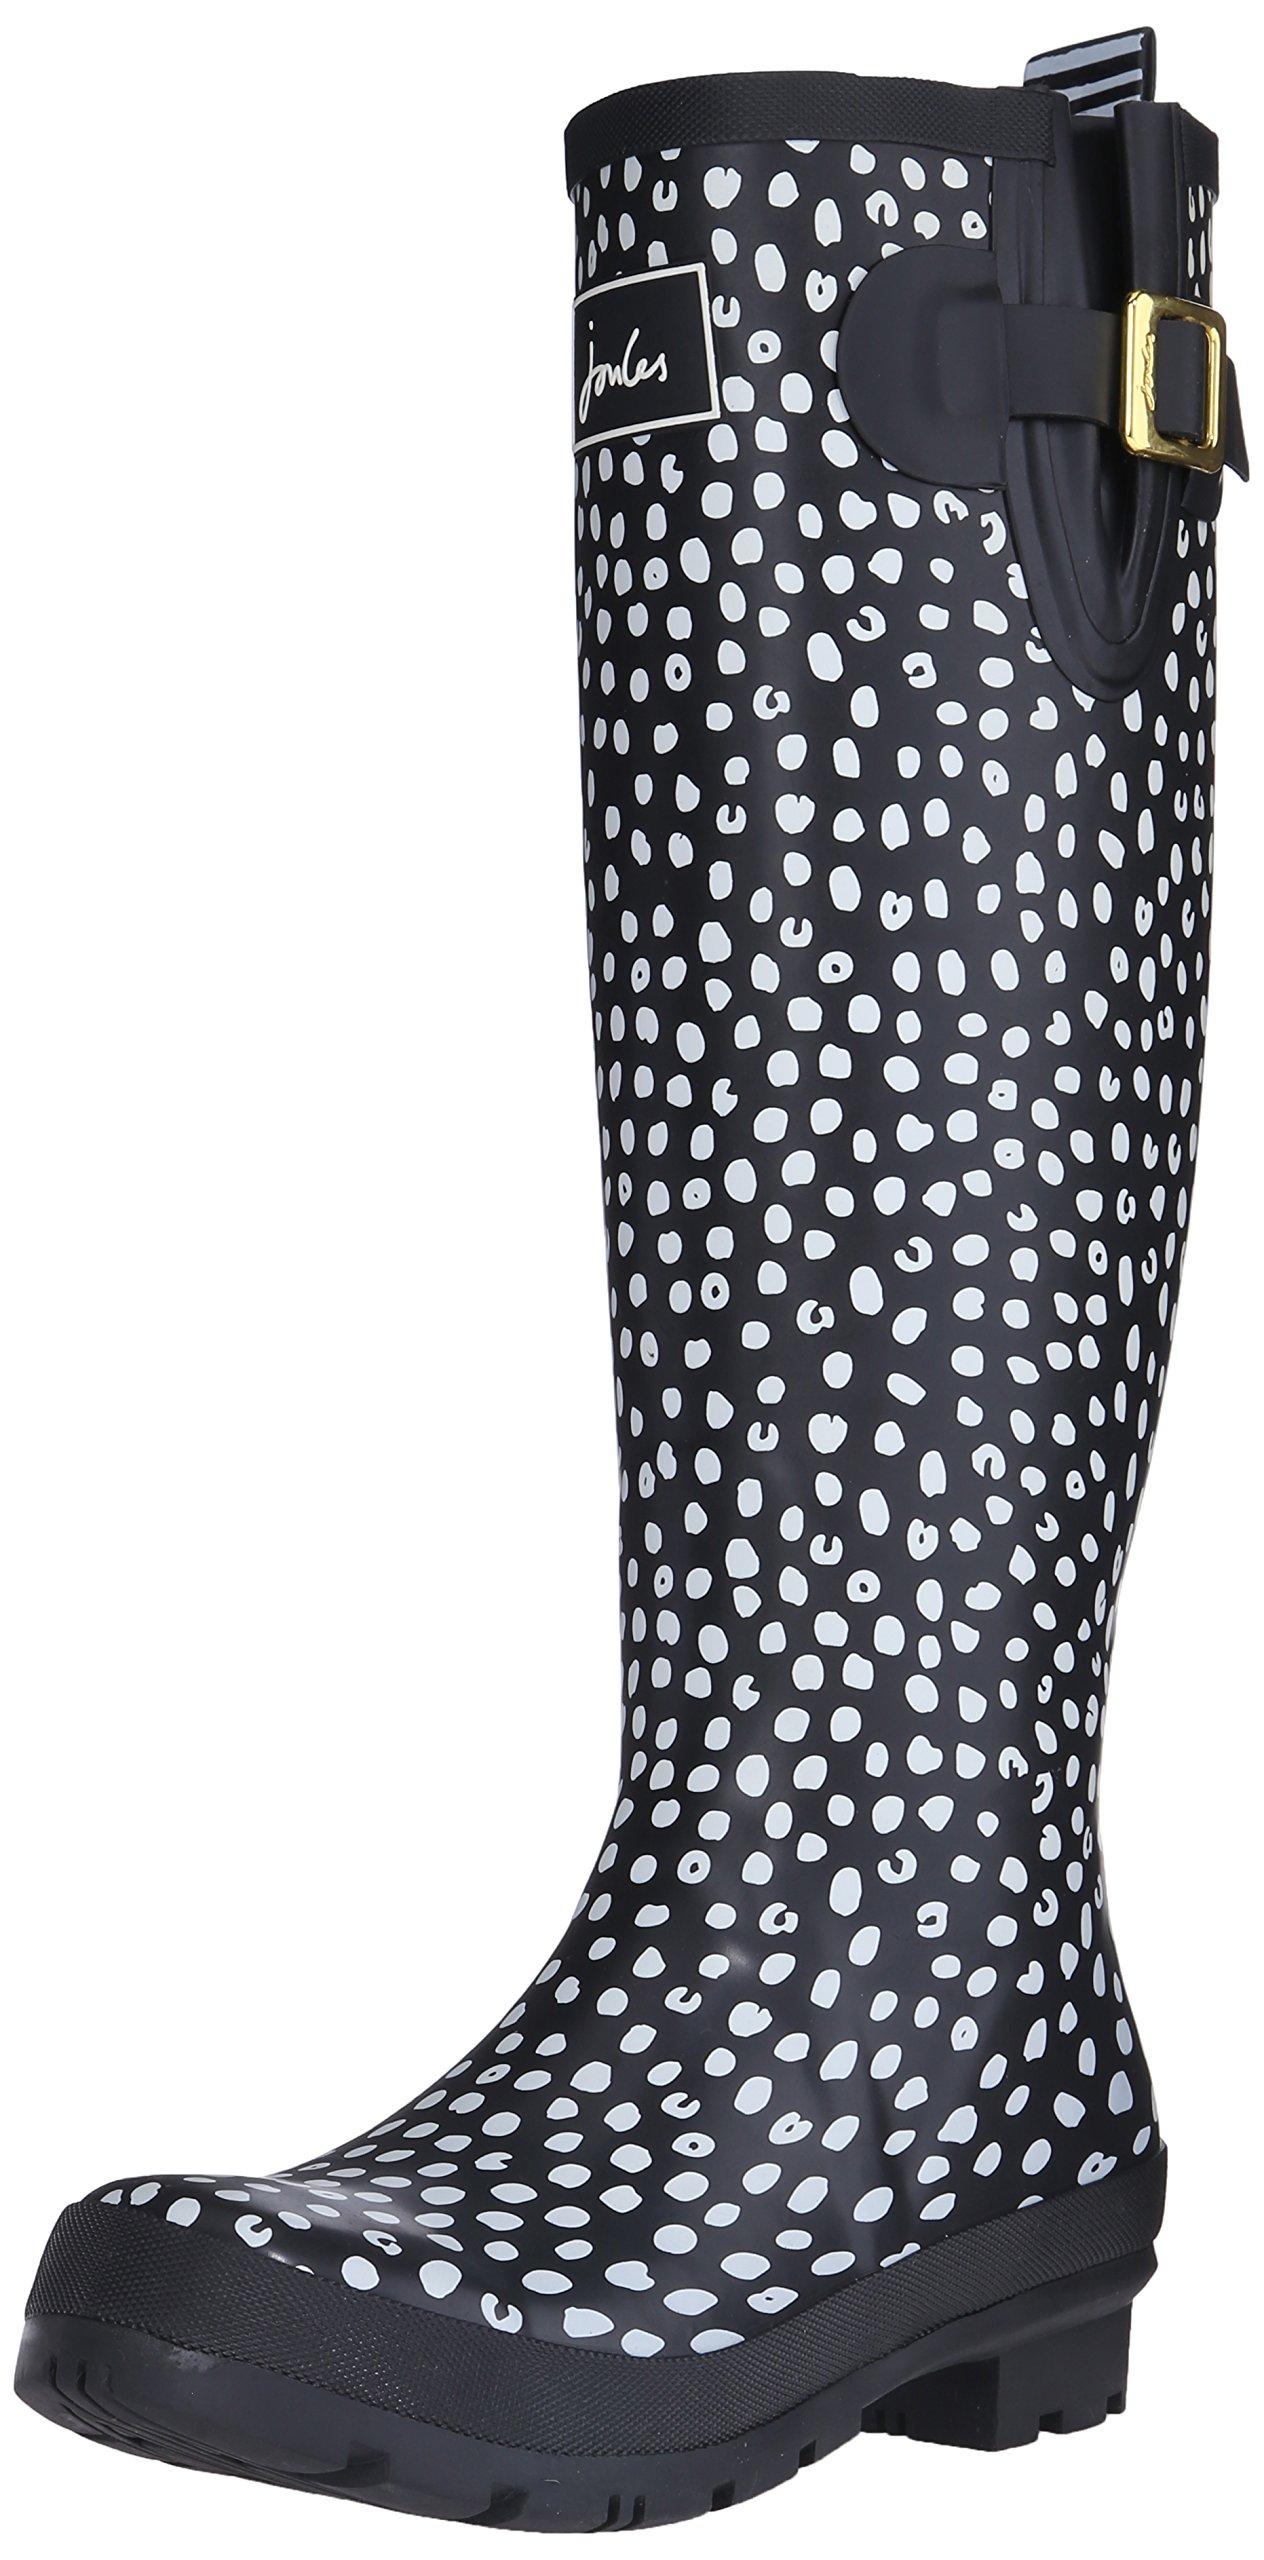 Joules Women's Wellyprint Rain Shoe, Black Spot White, 10 M US